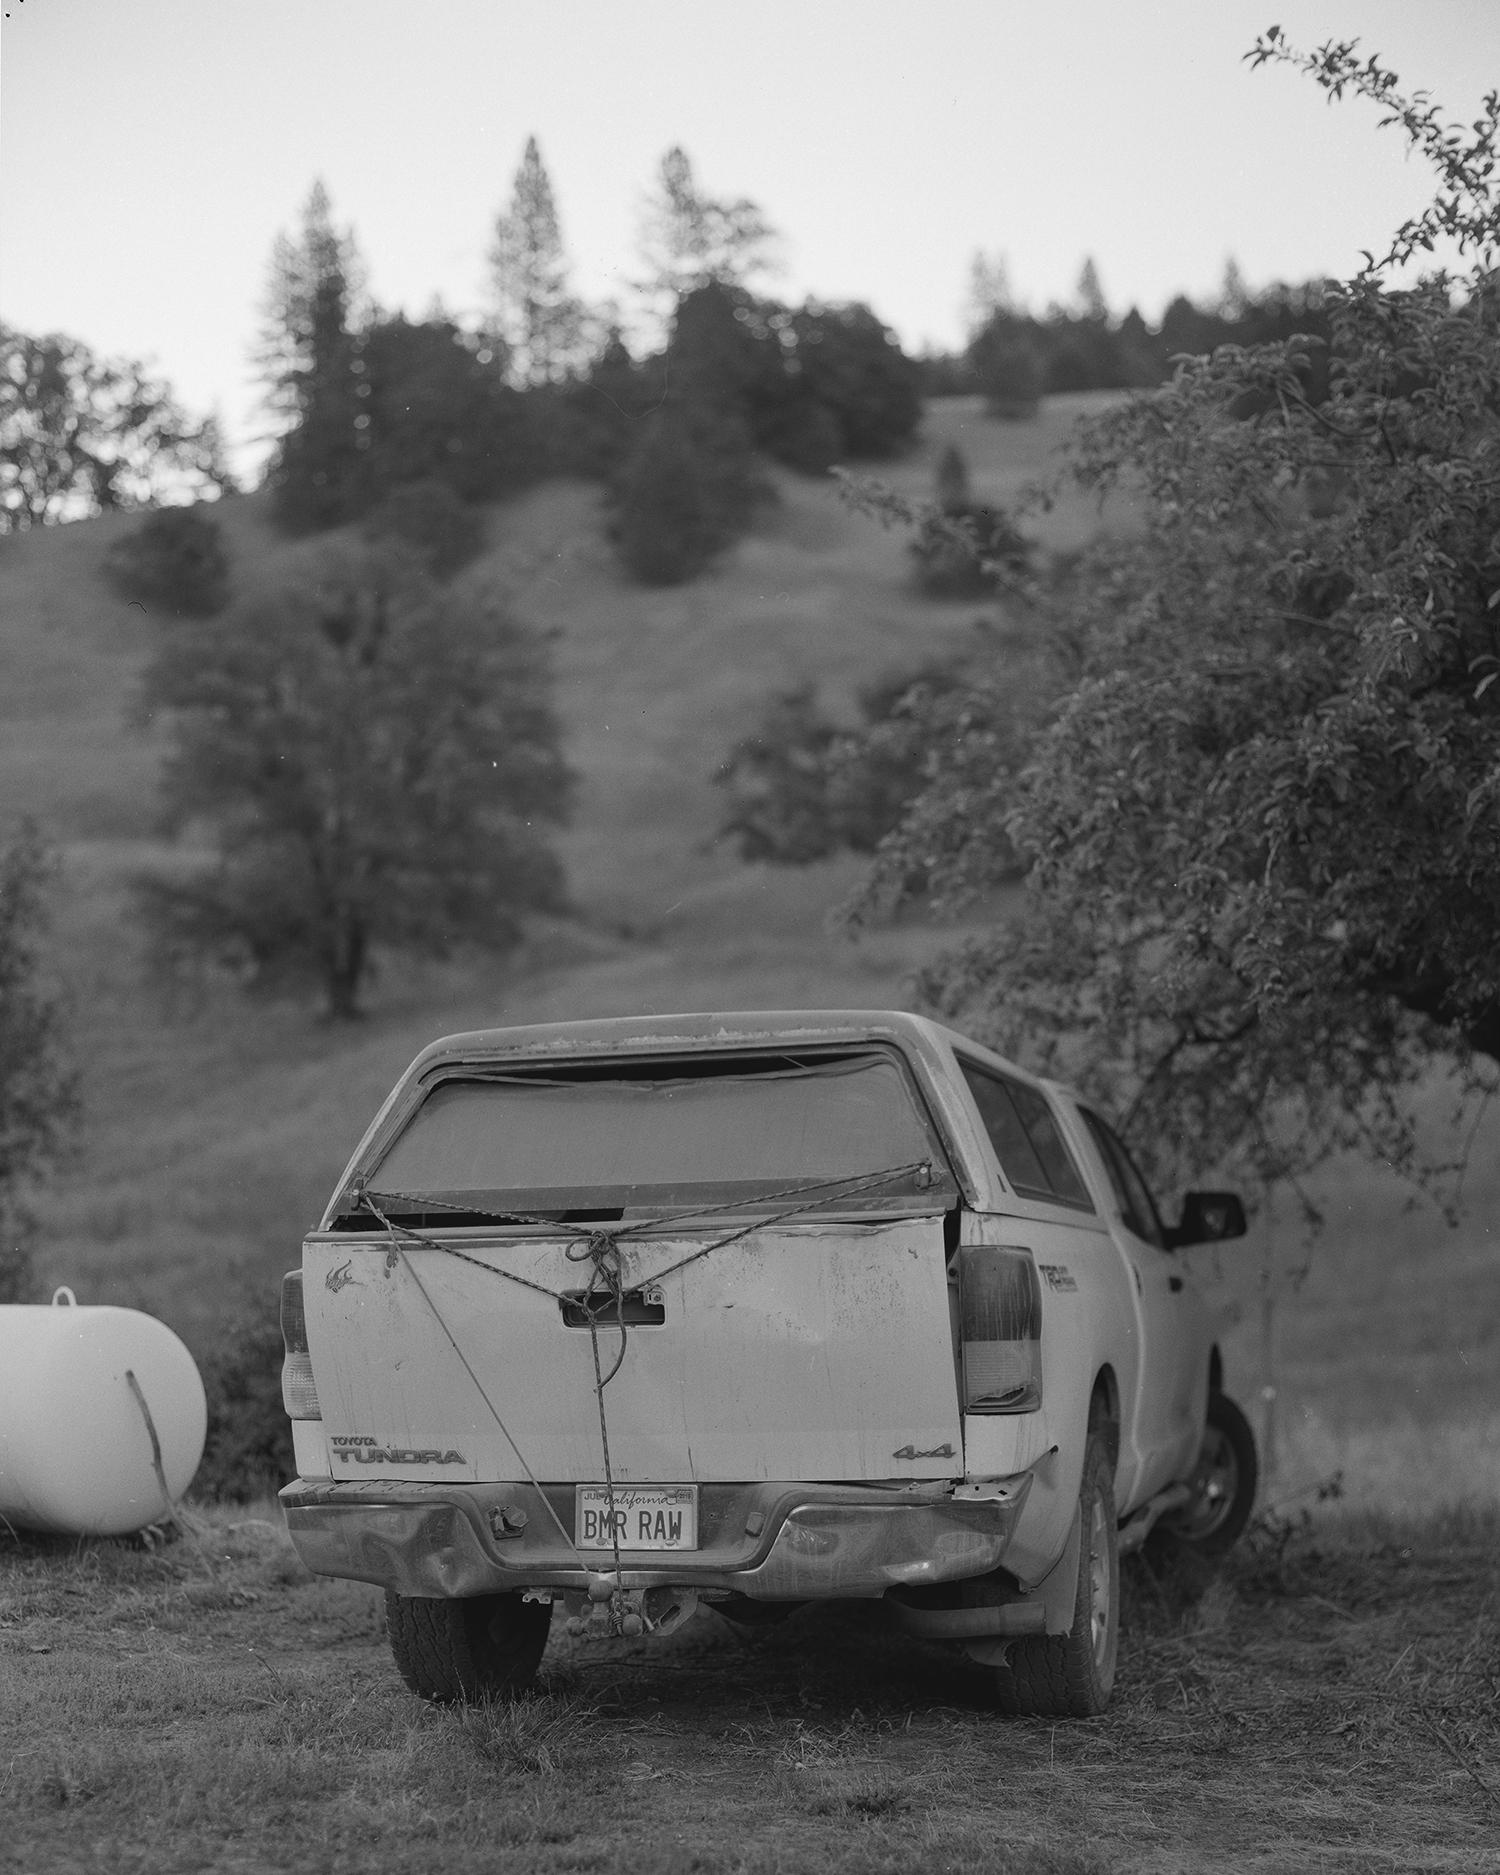 Richard's truck. License Plate BMR•RAW, Buck Mountain Ranch Richard A. Wilson